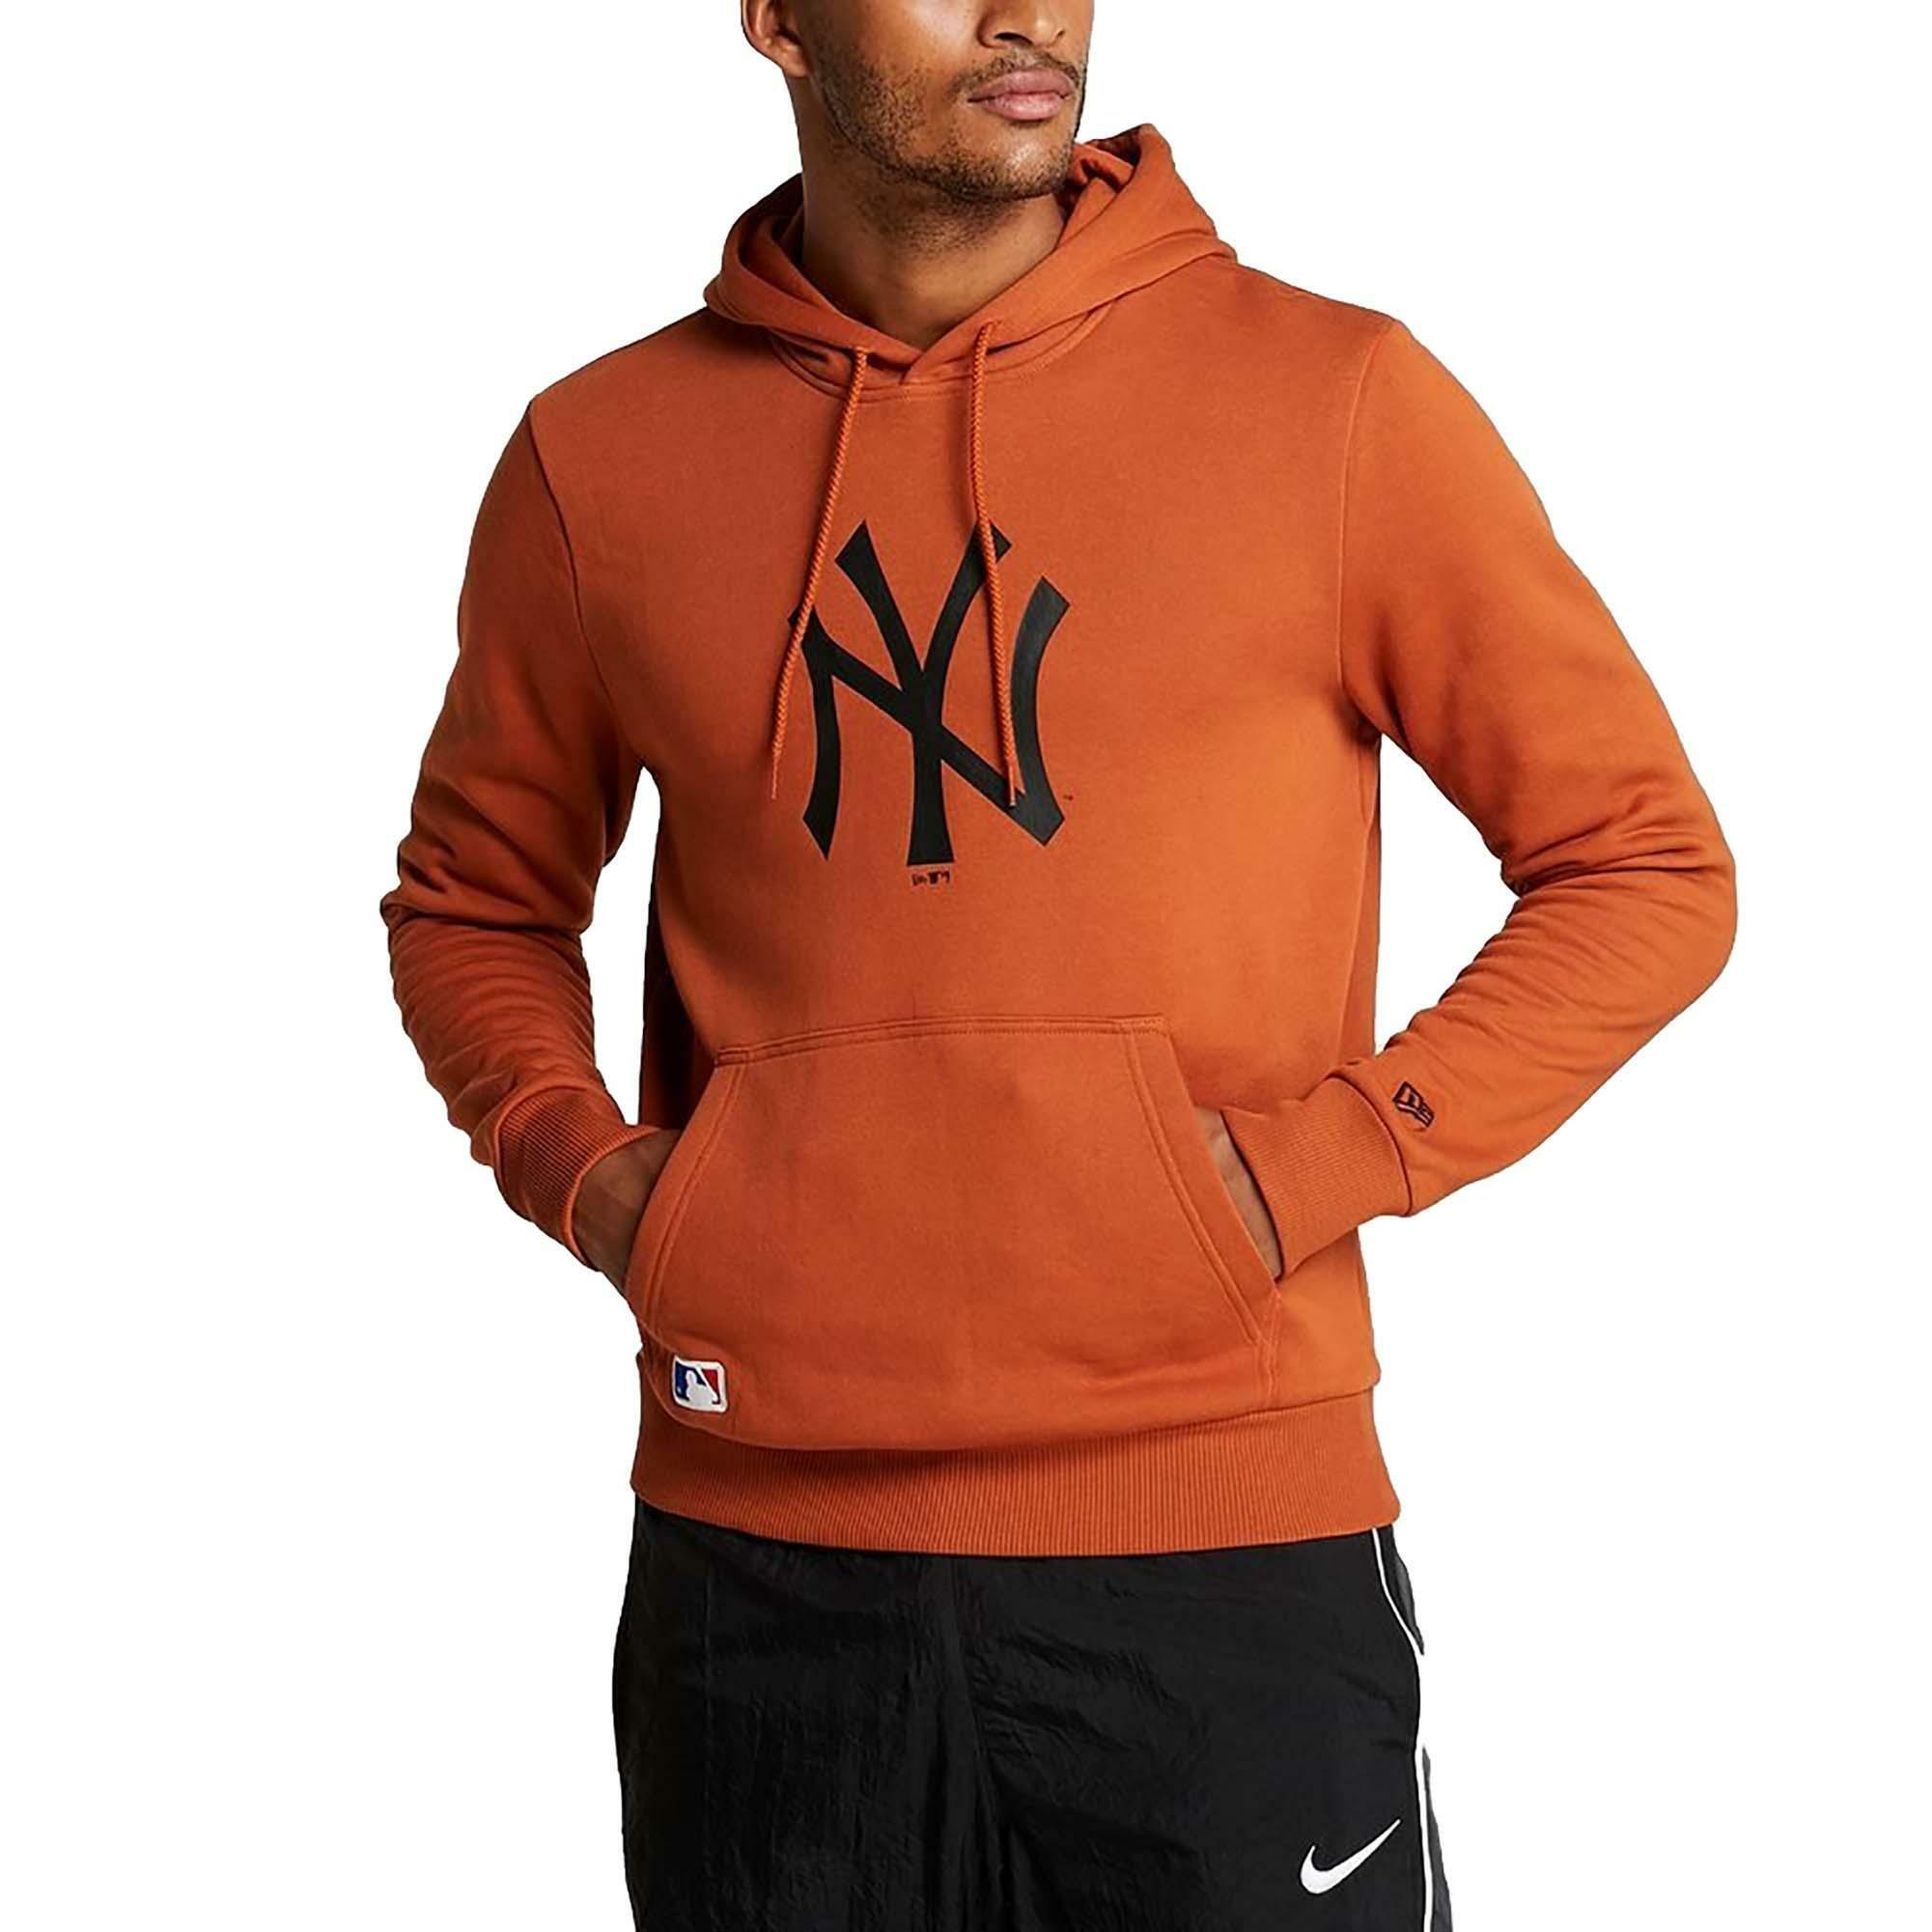 wholesale dealer 03d3a a660b New era mlb ny yankees team logo felpa con cappuccio uomo arancione 12033506